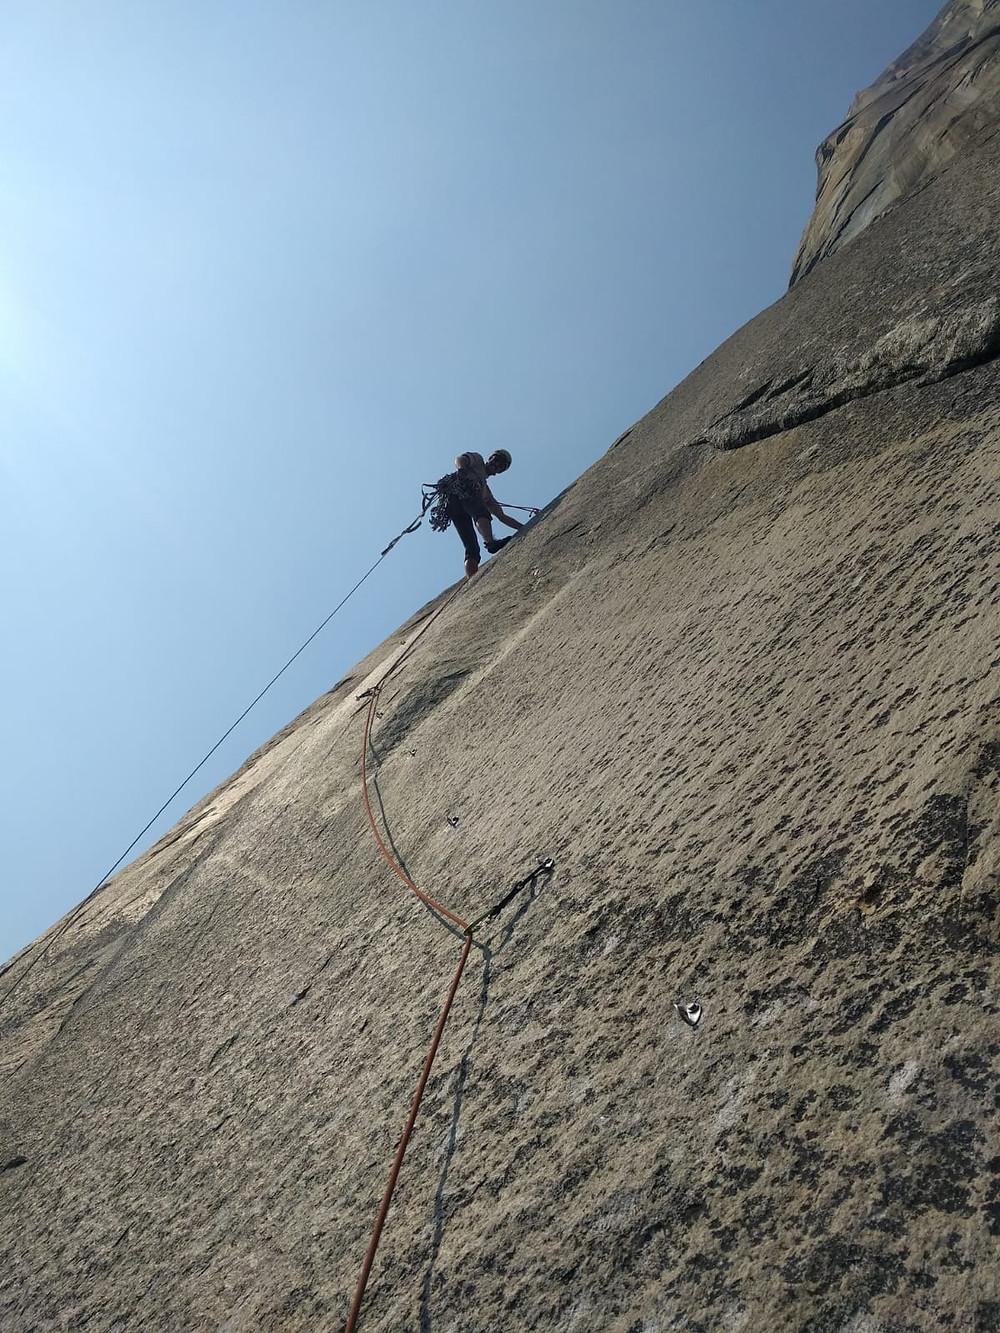 Climbing the Nose of El Capitan, Pitch 14.